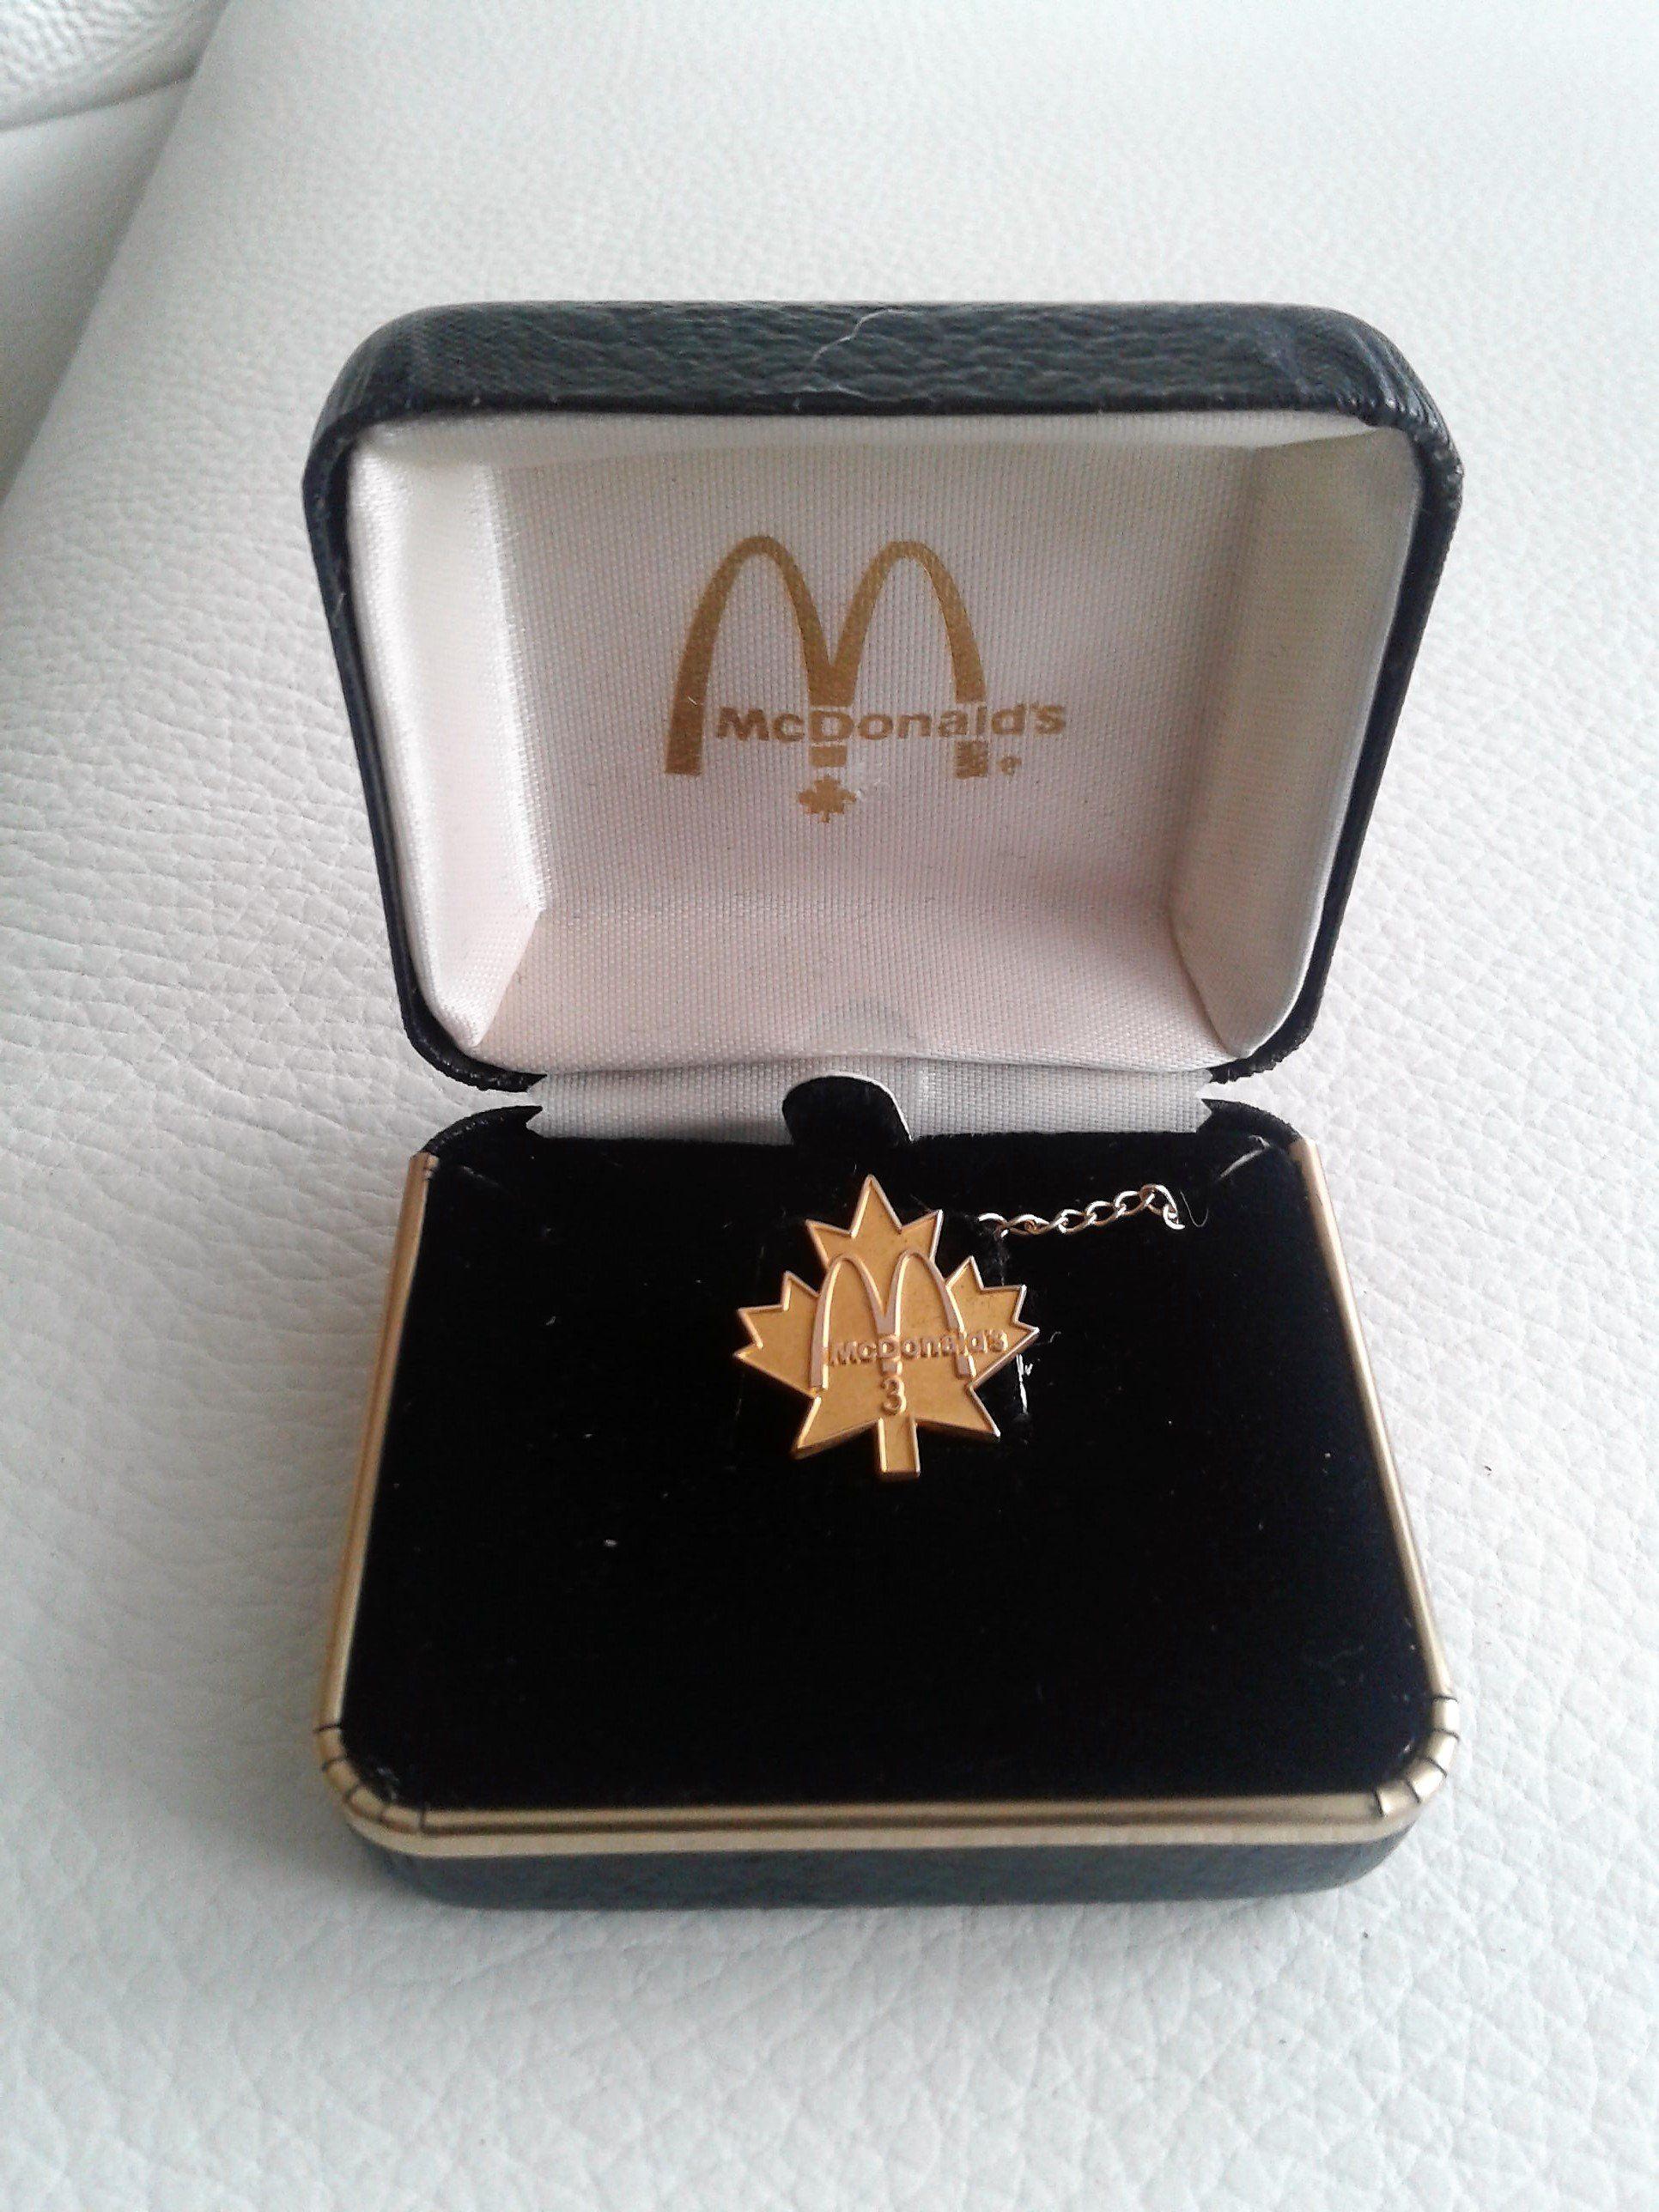 McDonald/'s Golden Potato Chips Pin Ornament Souvenir Gift